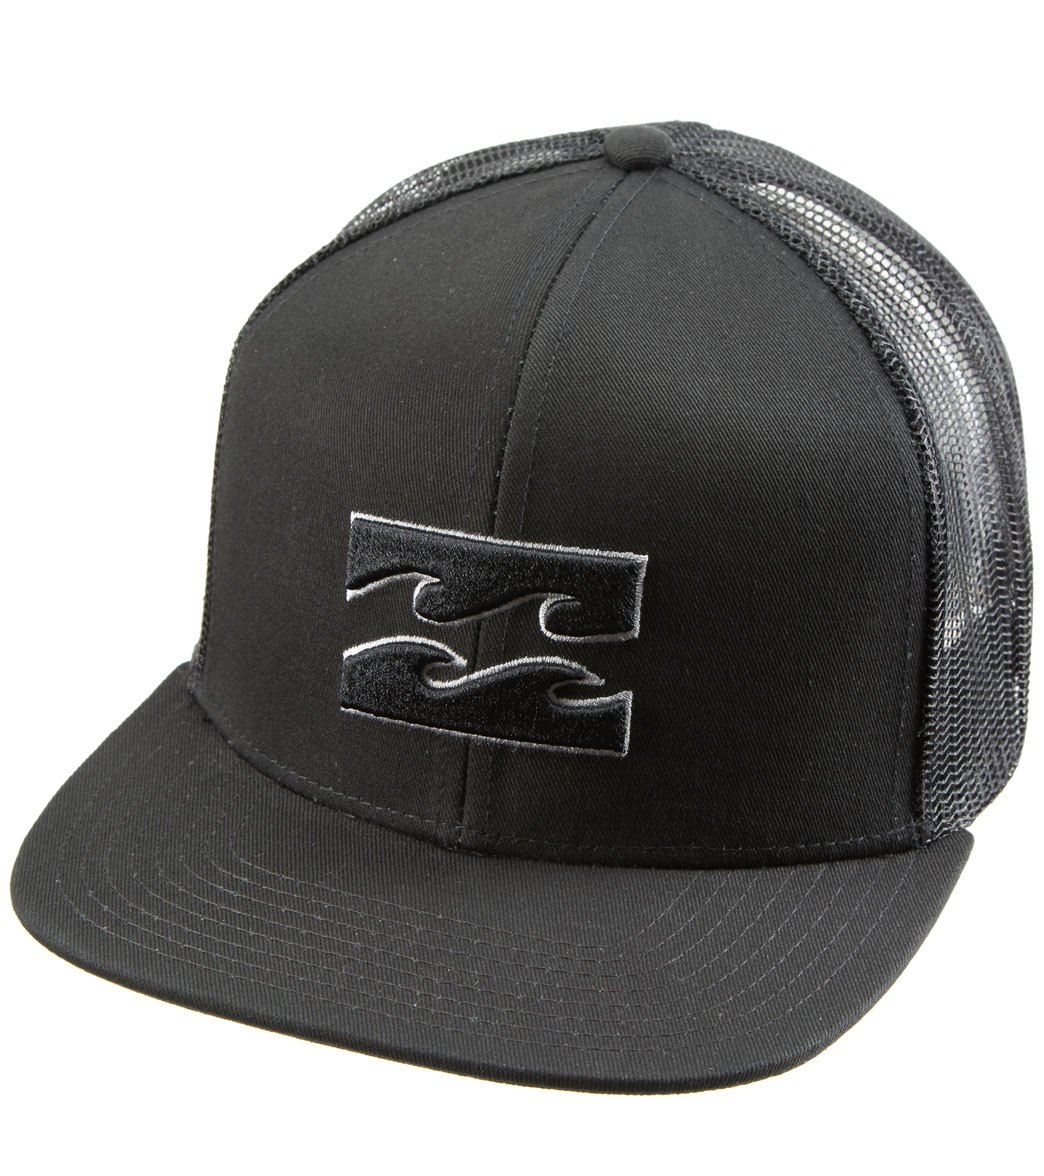 d23f3727d9f Billabong Men s All Day Trucker Hat at SwimOutlet.com